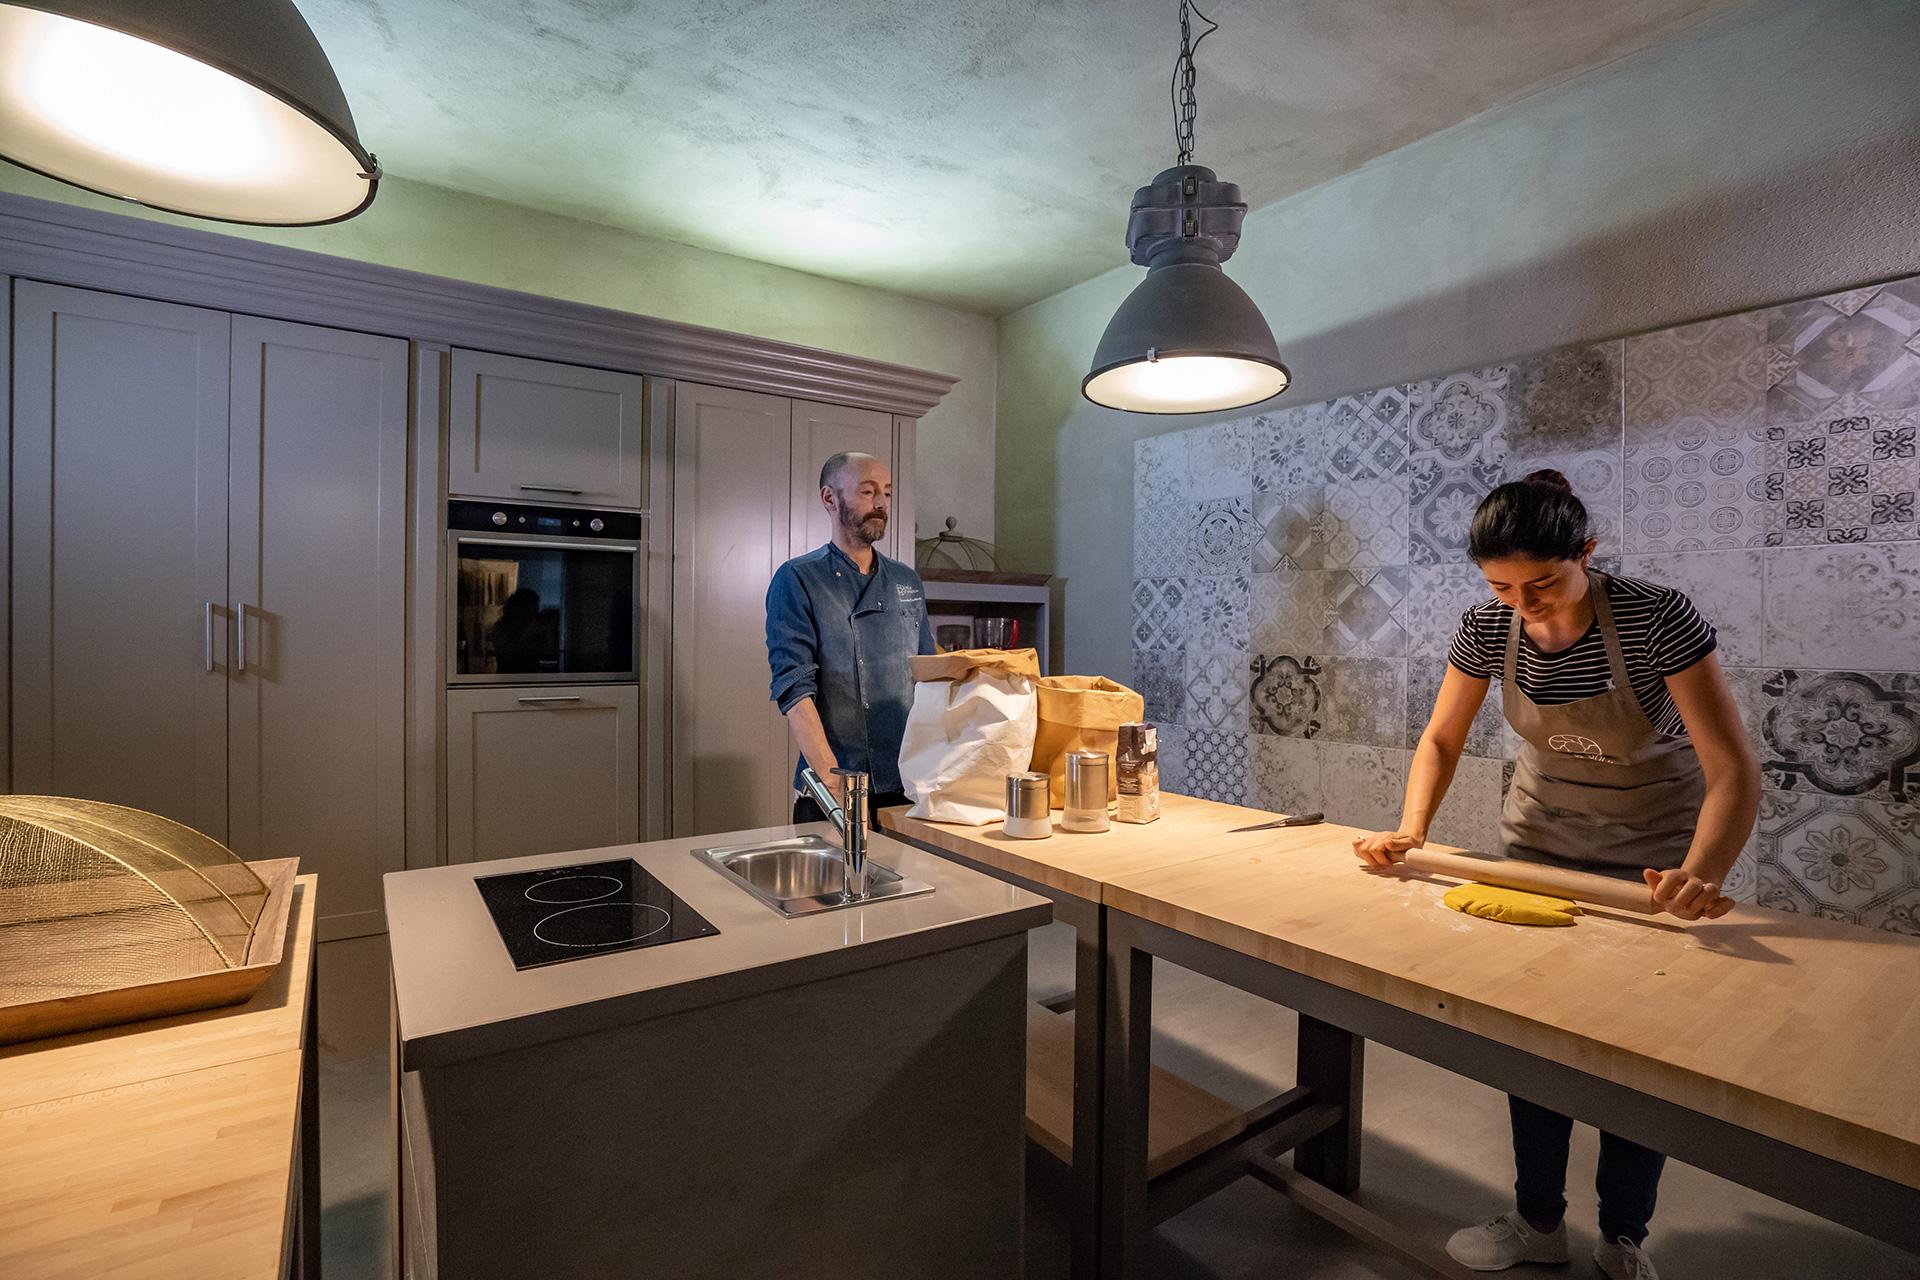 corsi di cucina in toscana nella cucina moderna di Villa Sassolini